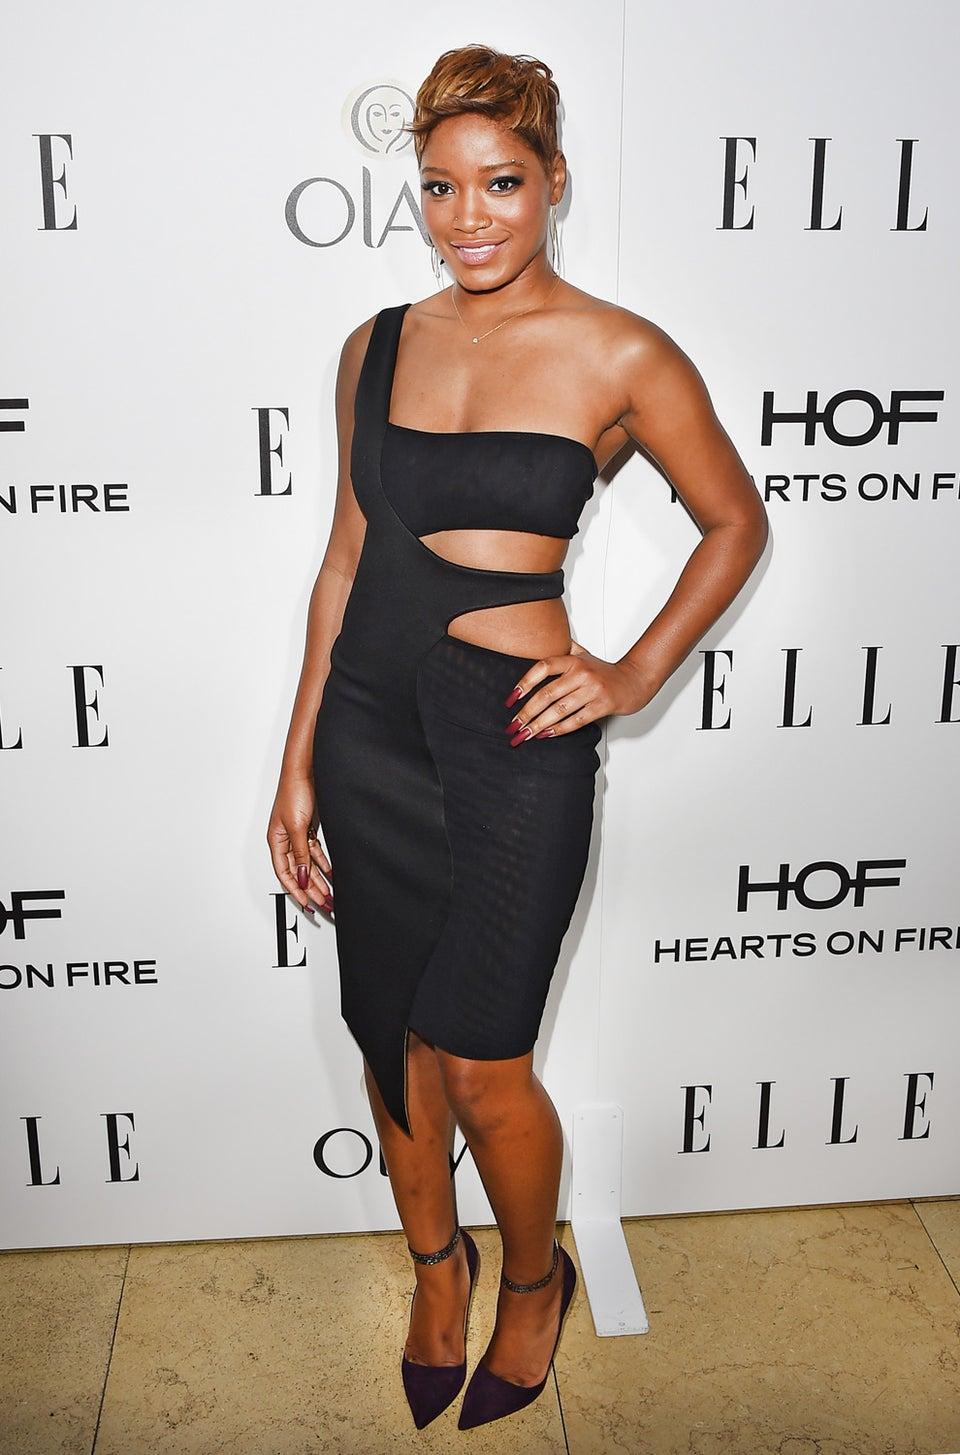 Keke Palmer Lands Role in New Series, 'Scream Queens'